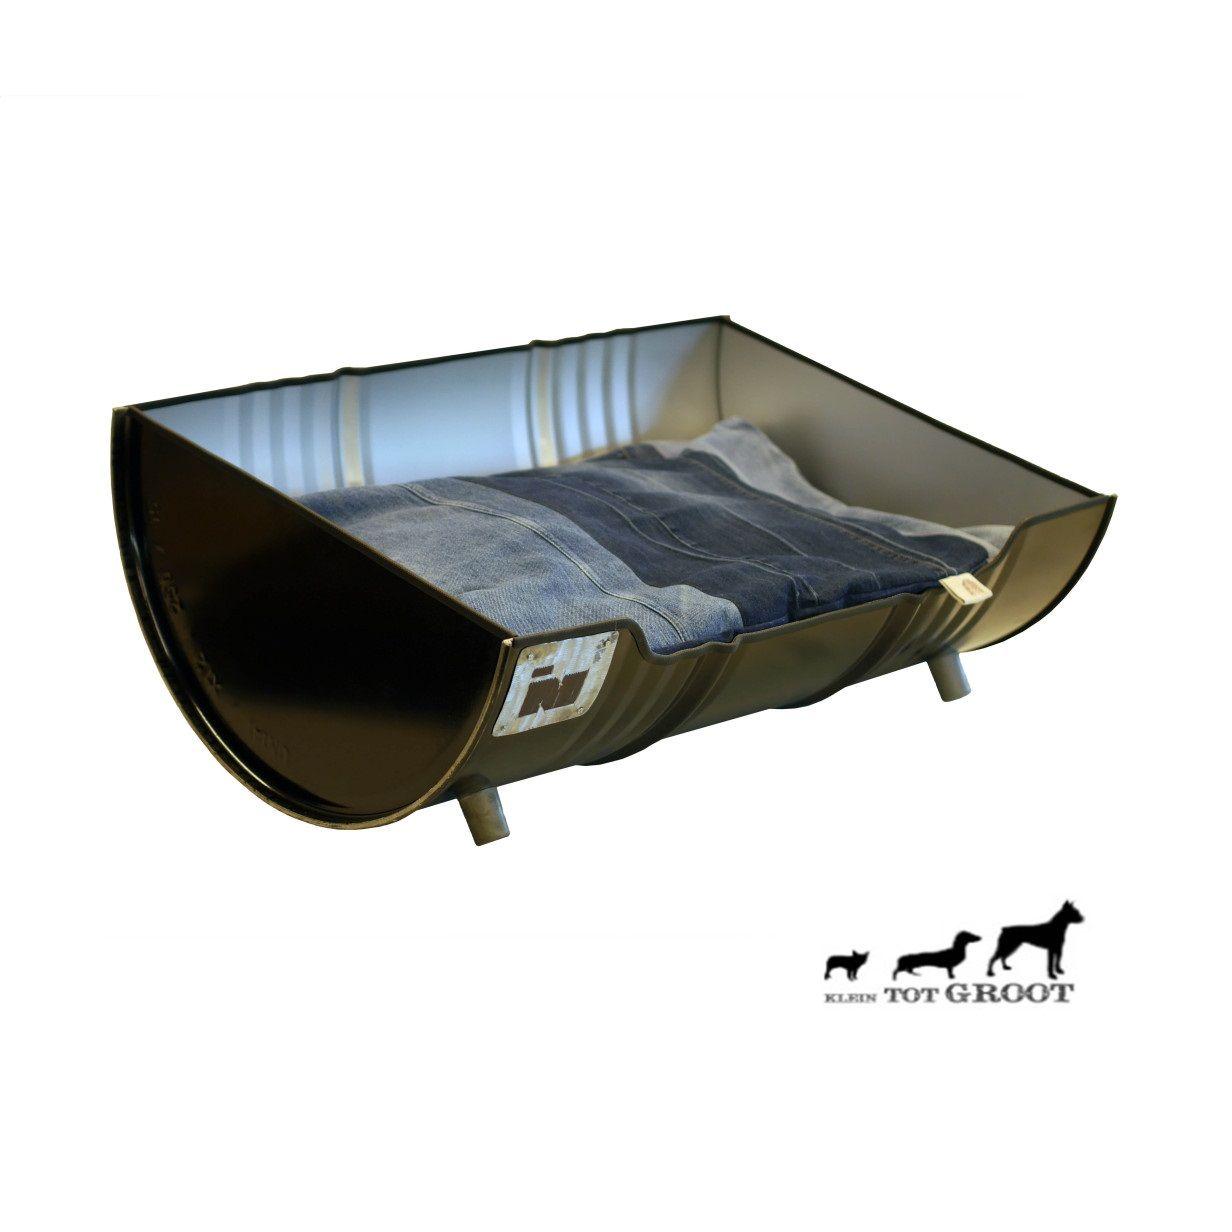 Stoere Hondenmand Olievat Xxl Industrieel En Origineel Indusigns Nl Hondenmand Hond Kat Honden